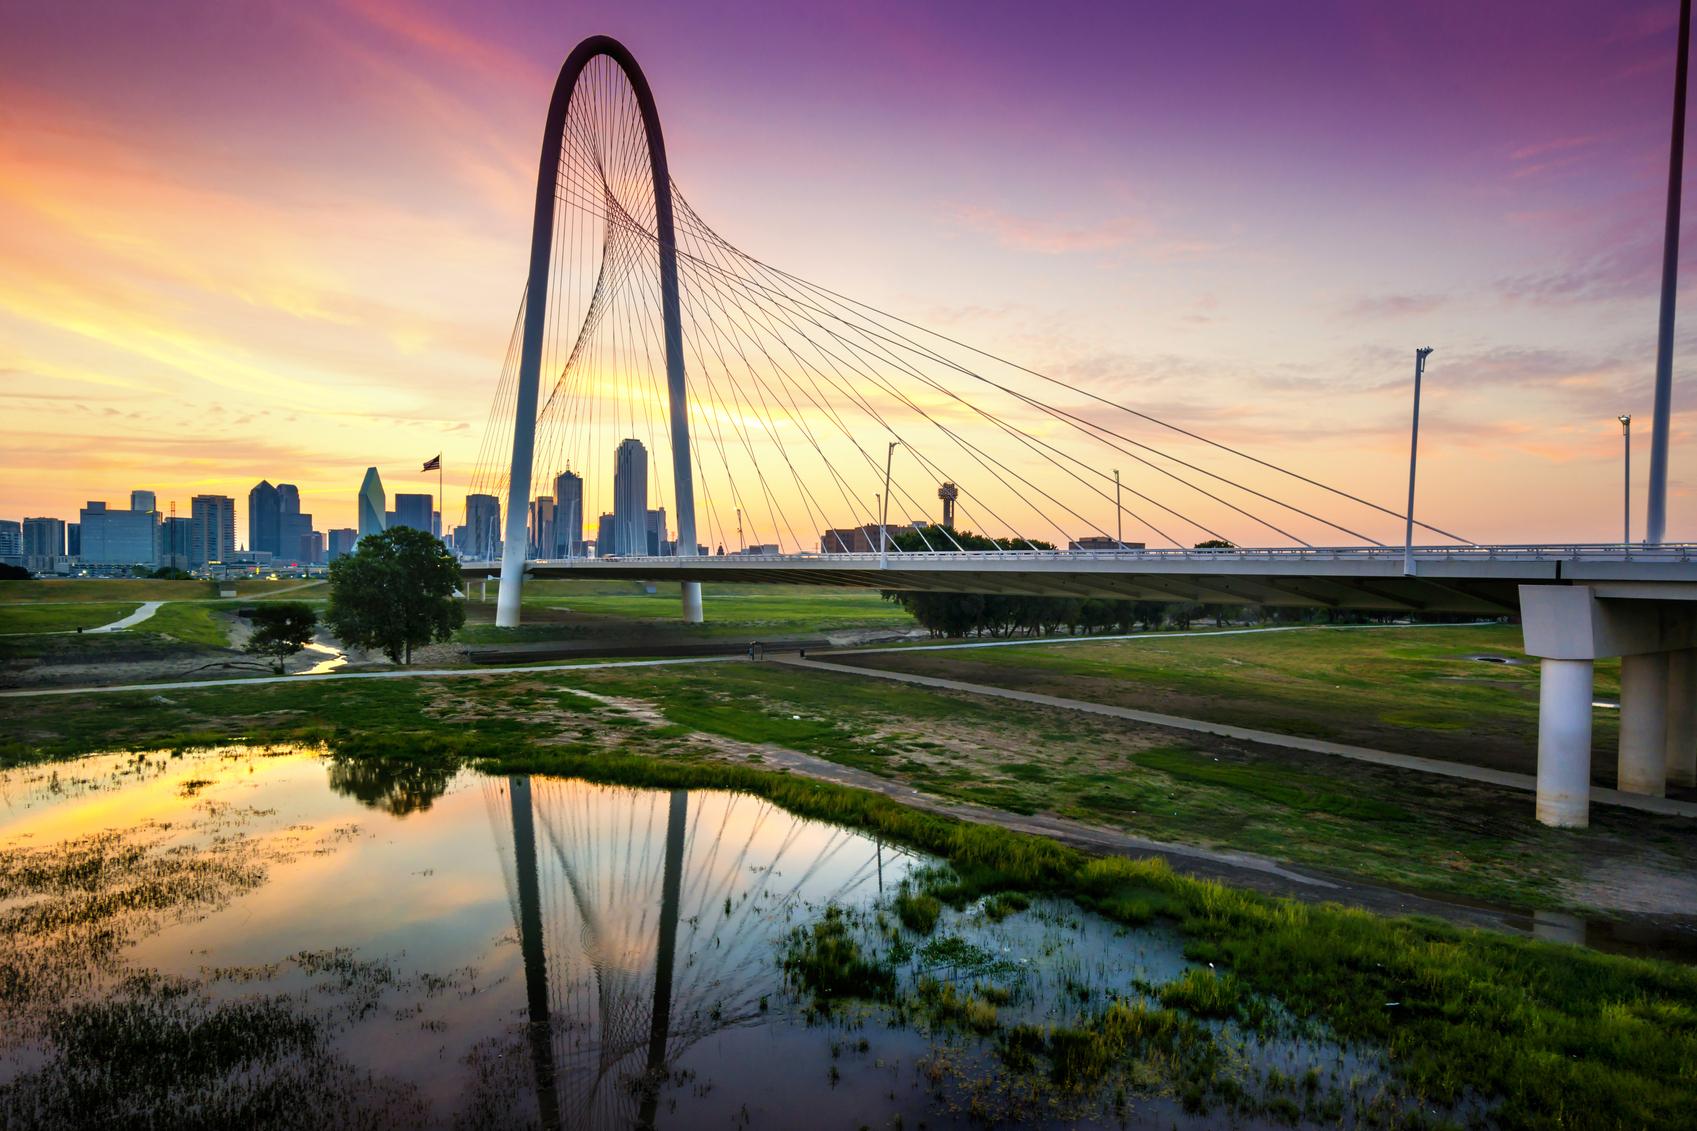 Dallas at sunrise. Texas